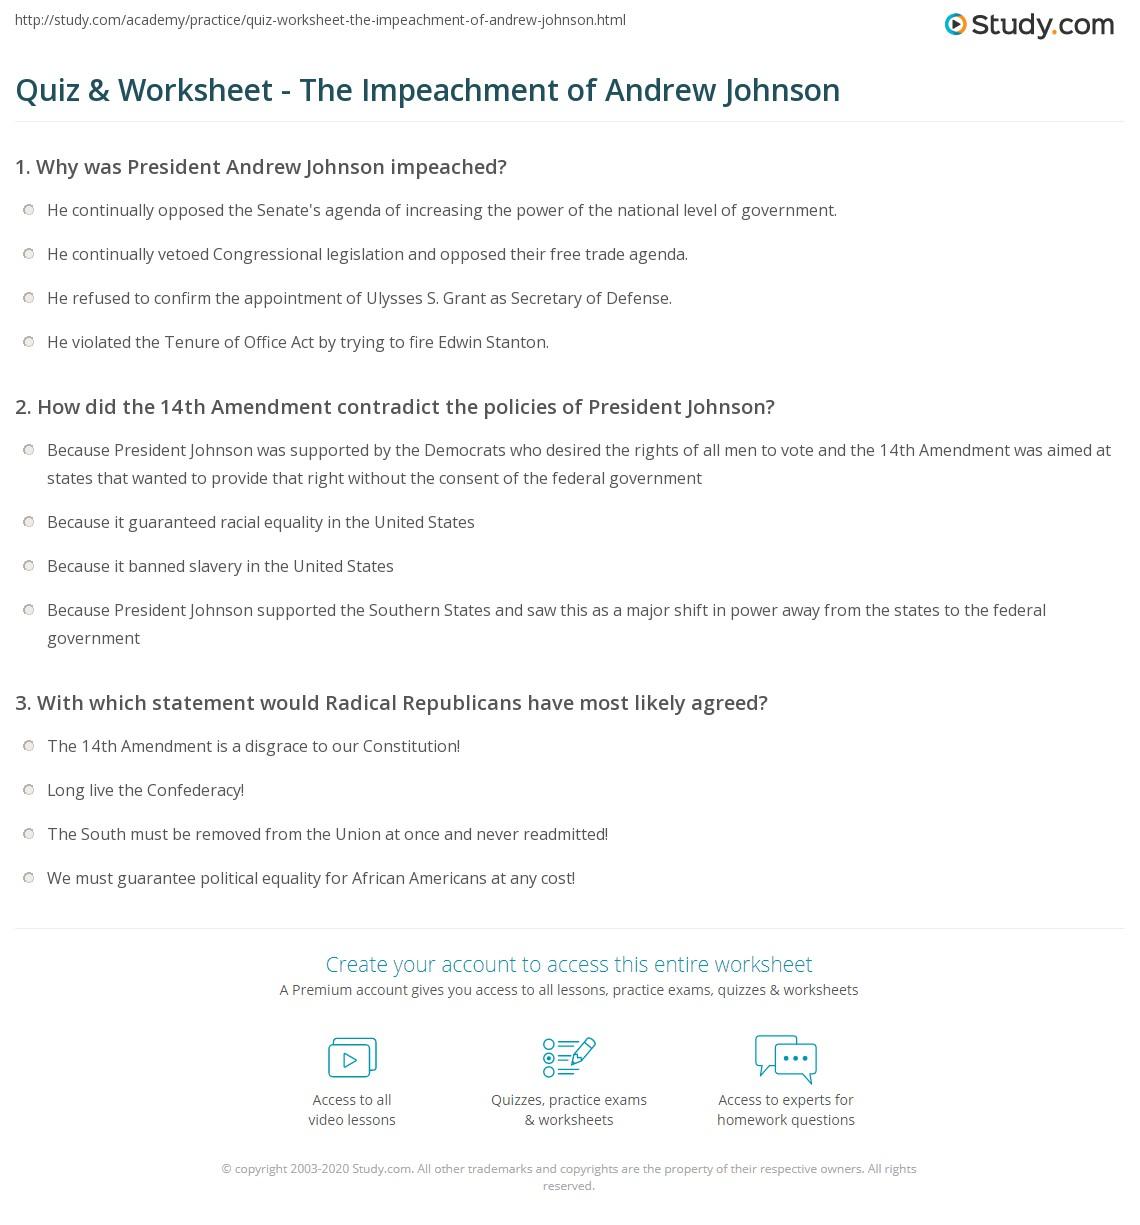 Quiz & Worksheet - The Impeachment of Andrew Johnson | Study.com